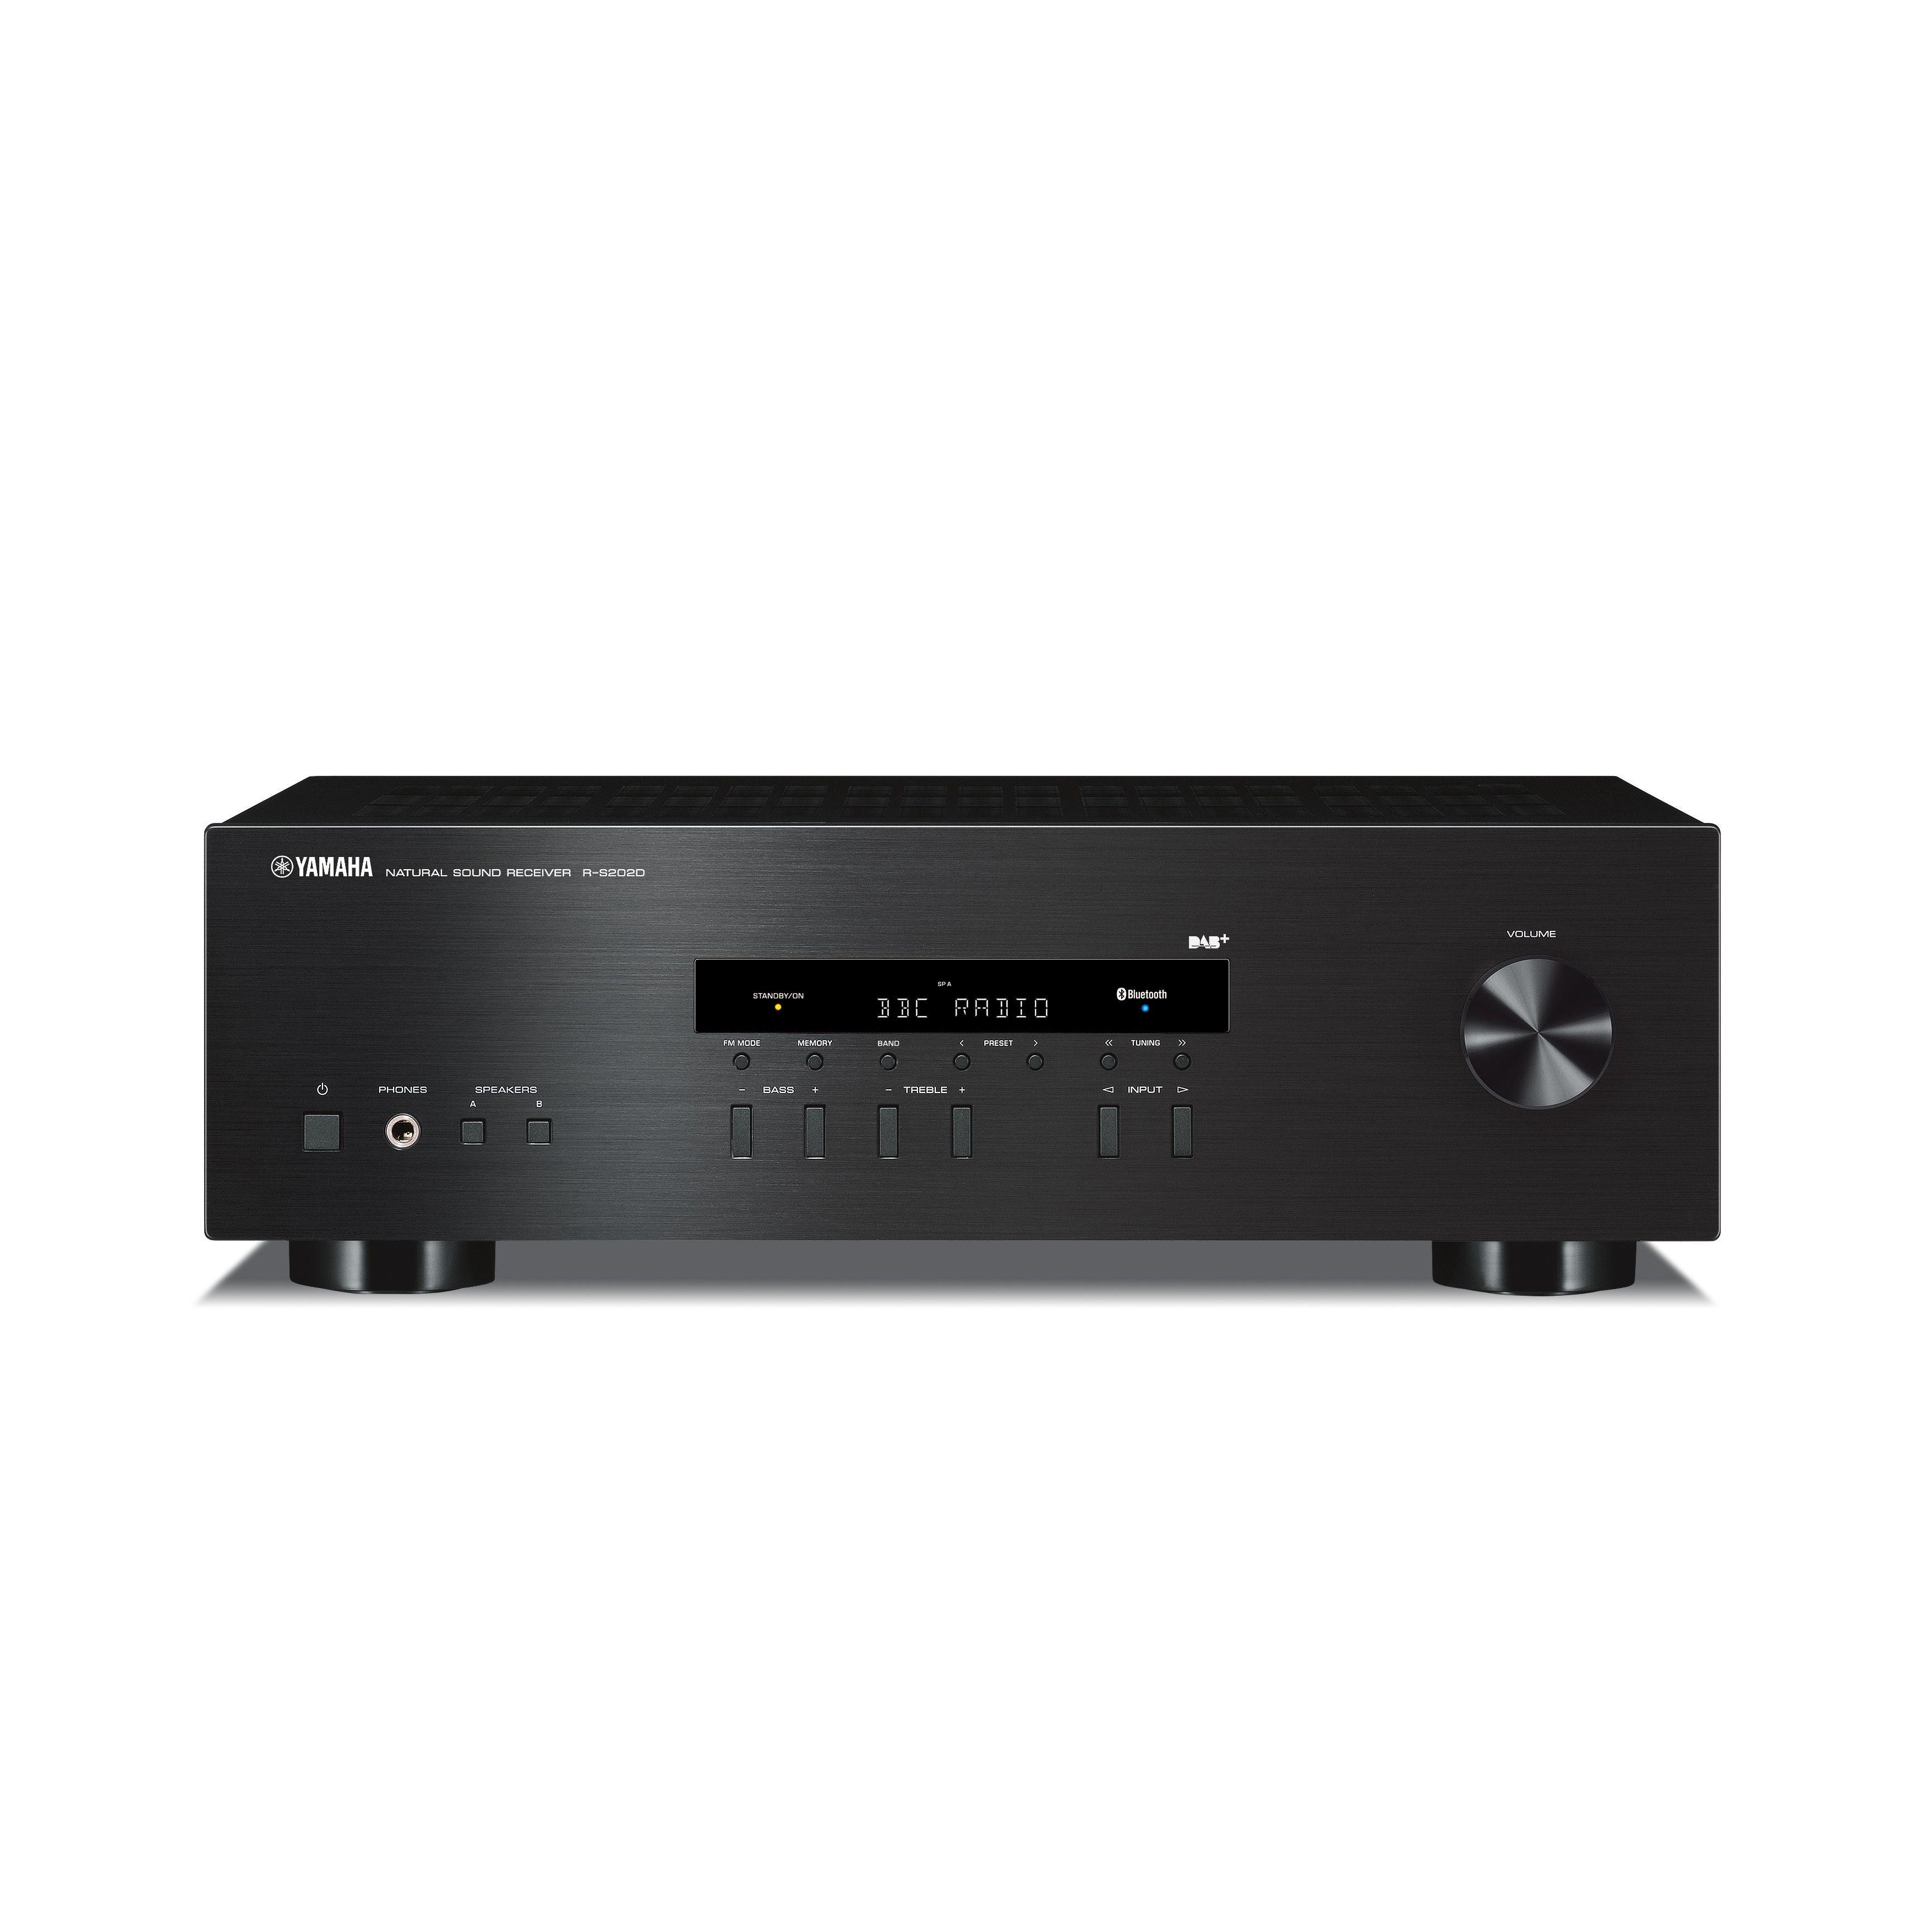 R-S202D - Funktionen - HiFi-Komponenten - Audio & Video ...